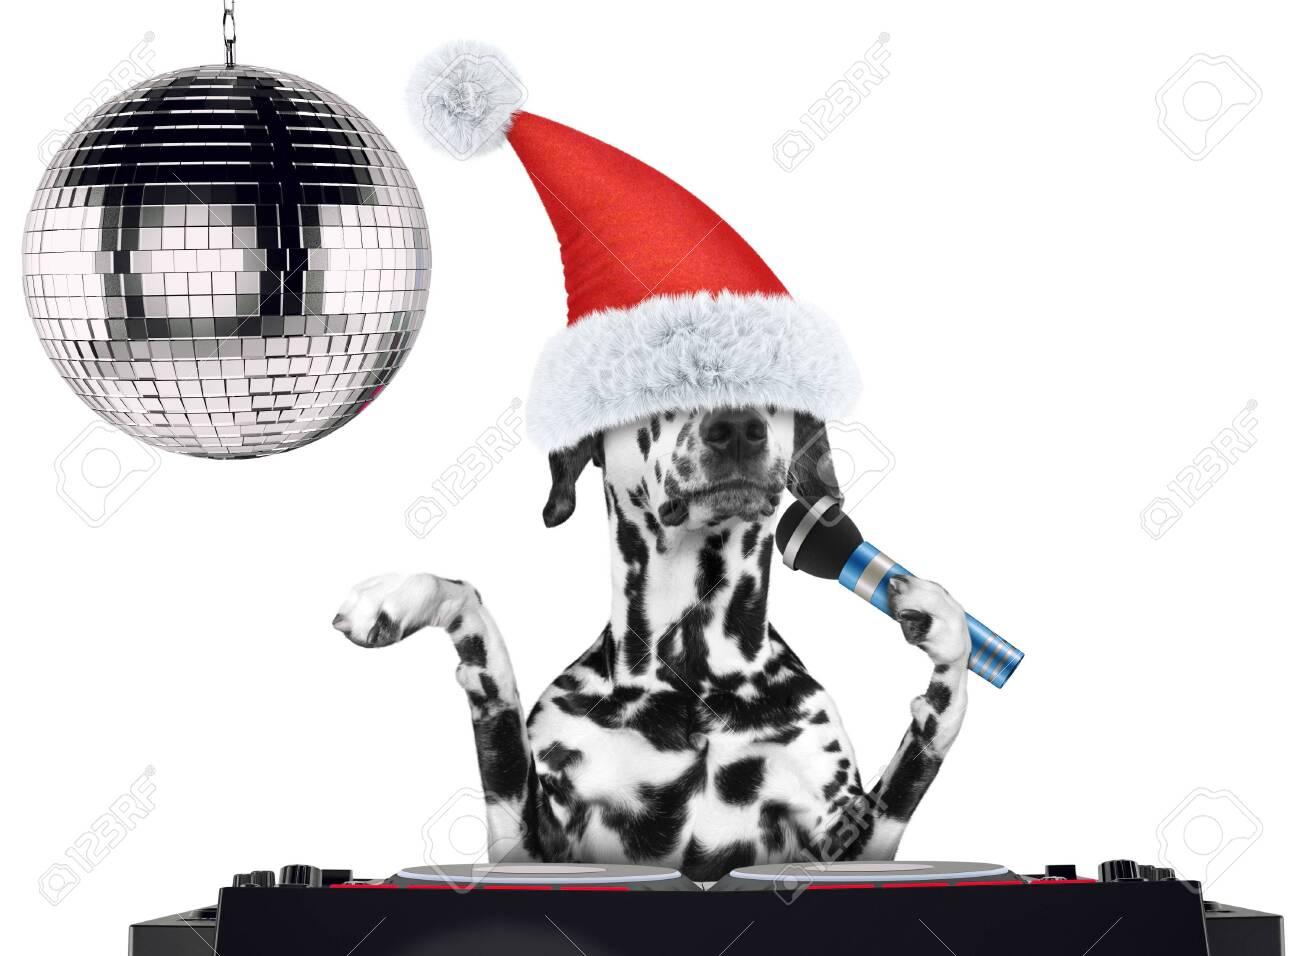 Karaoke Christmas Musical.Dalmatian Dog In Christmas Hats Singing With Microphone A Karaoke